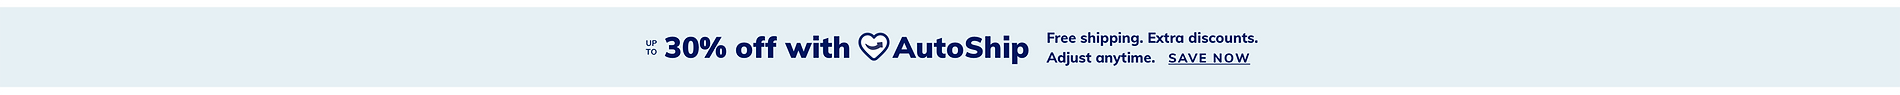 Subhero_AutoShip_2400.png